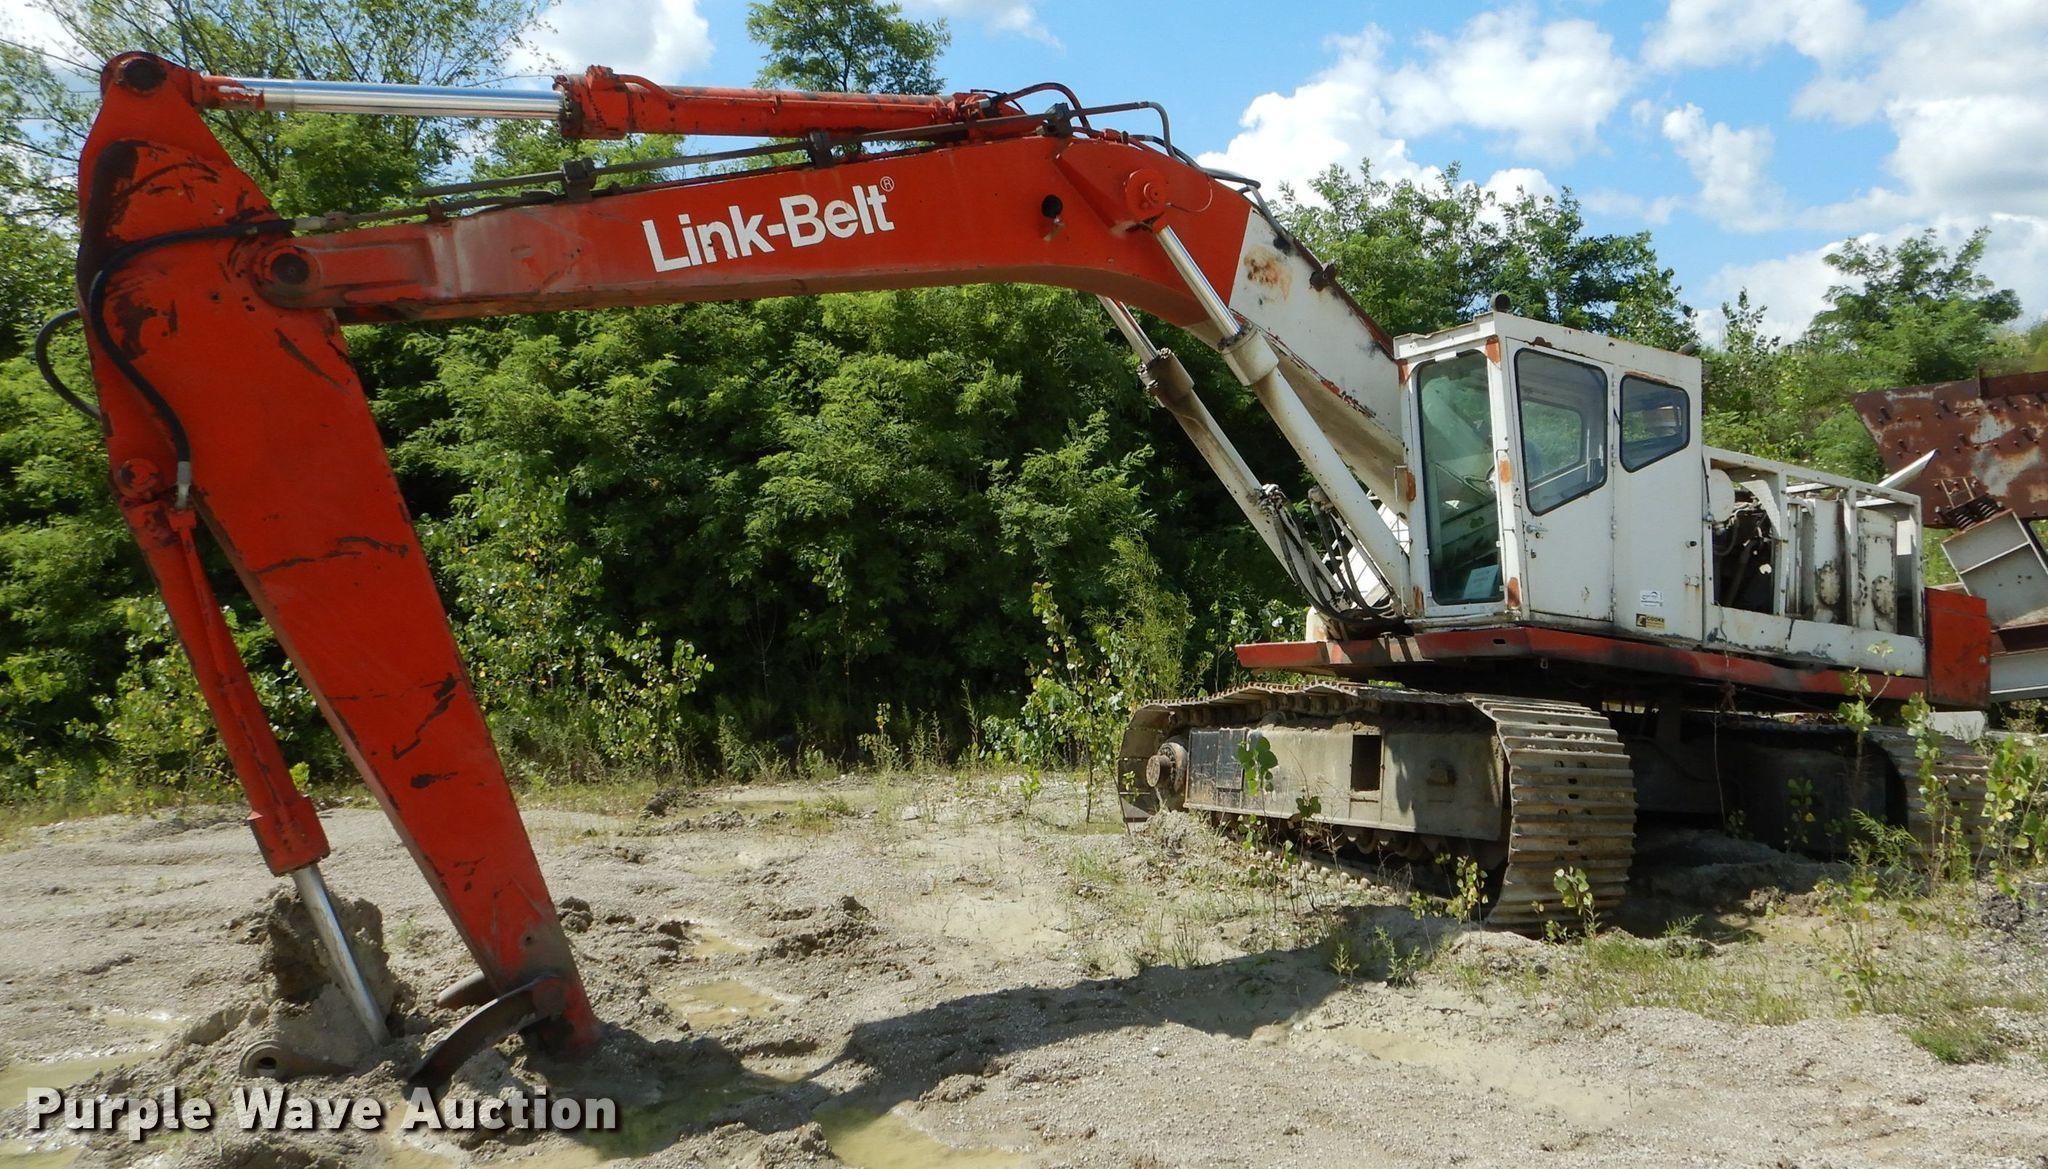 Link Belt excavator | Item DH6022 | Thursday August 22 Const